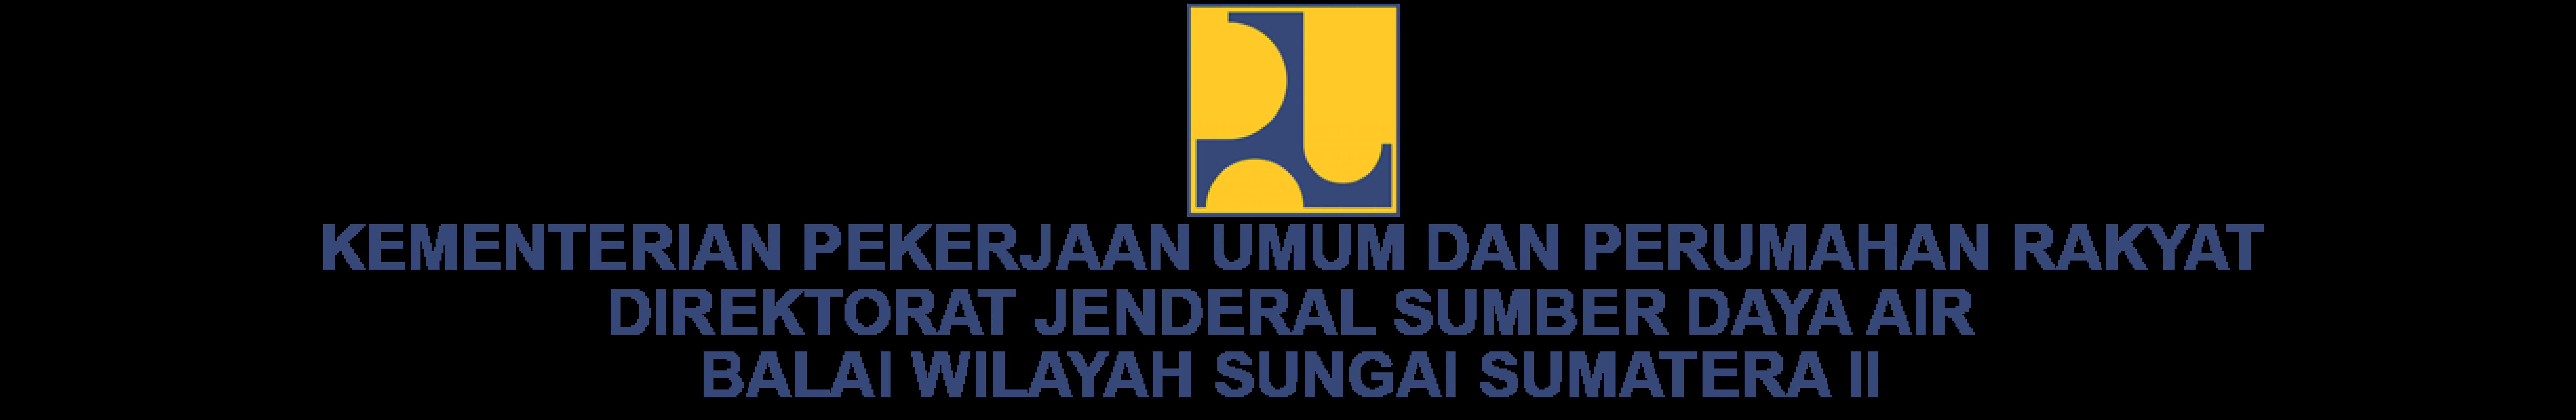 BALAI WILAYAH SUNGAI SUMATERA II